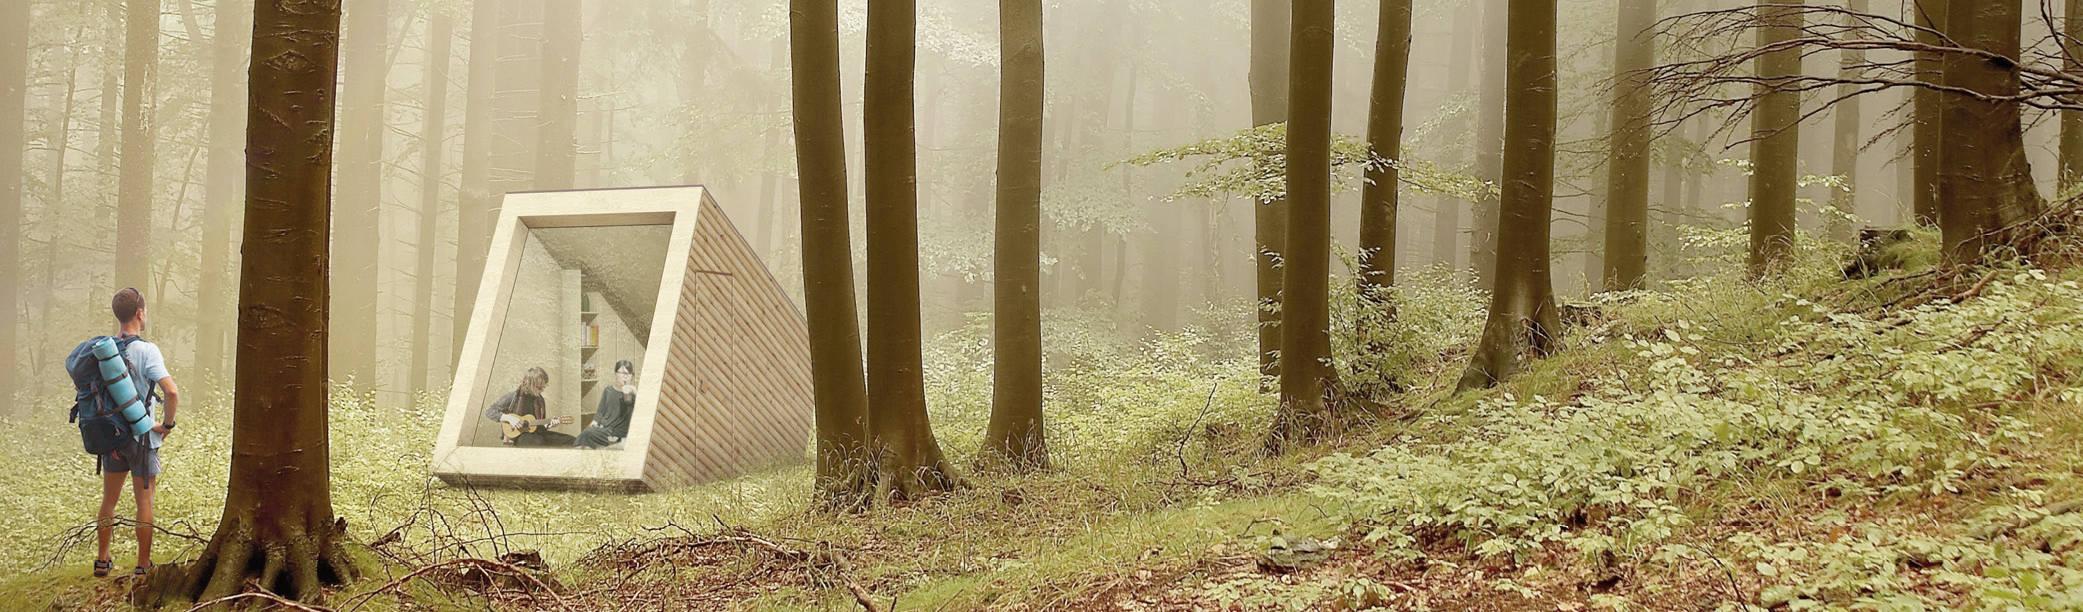 NOHNIK architecture and landscapes